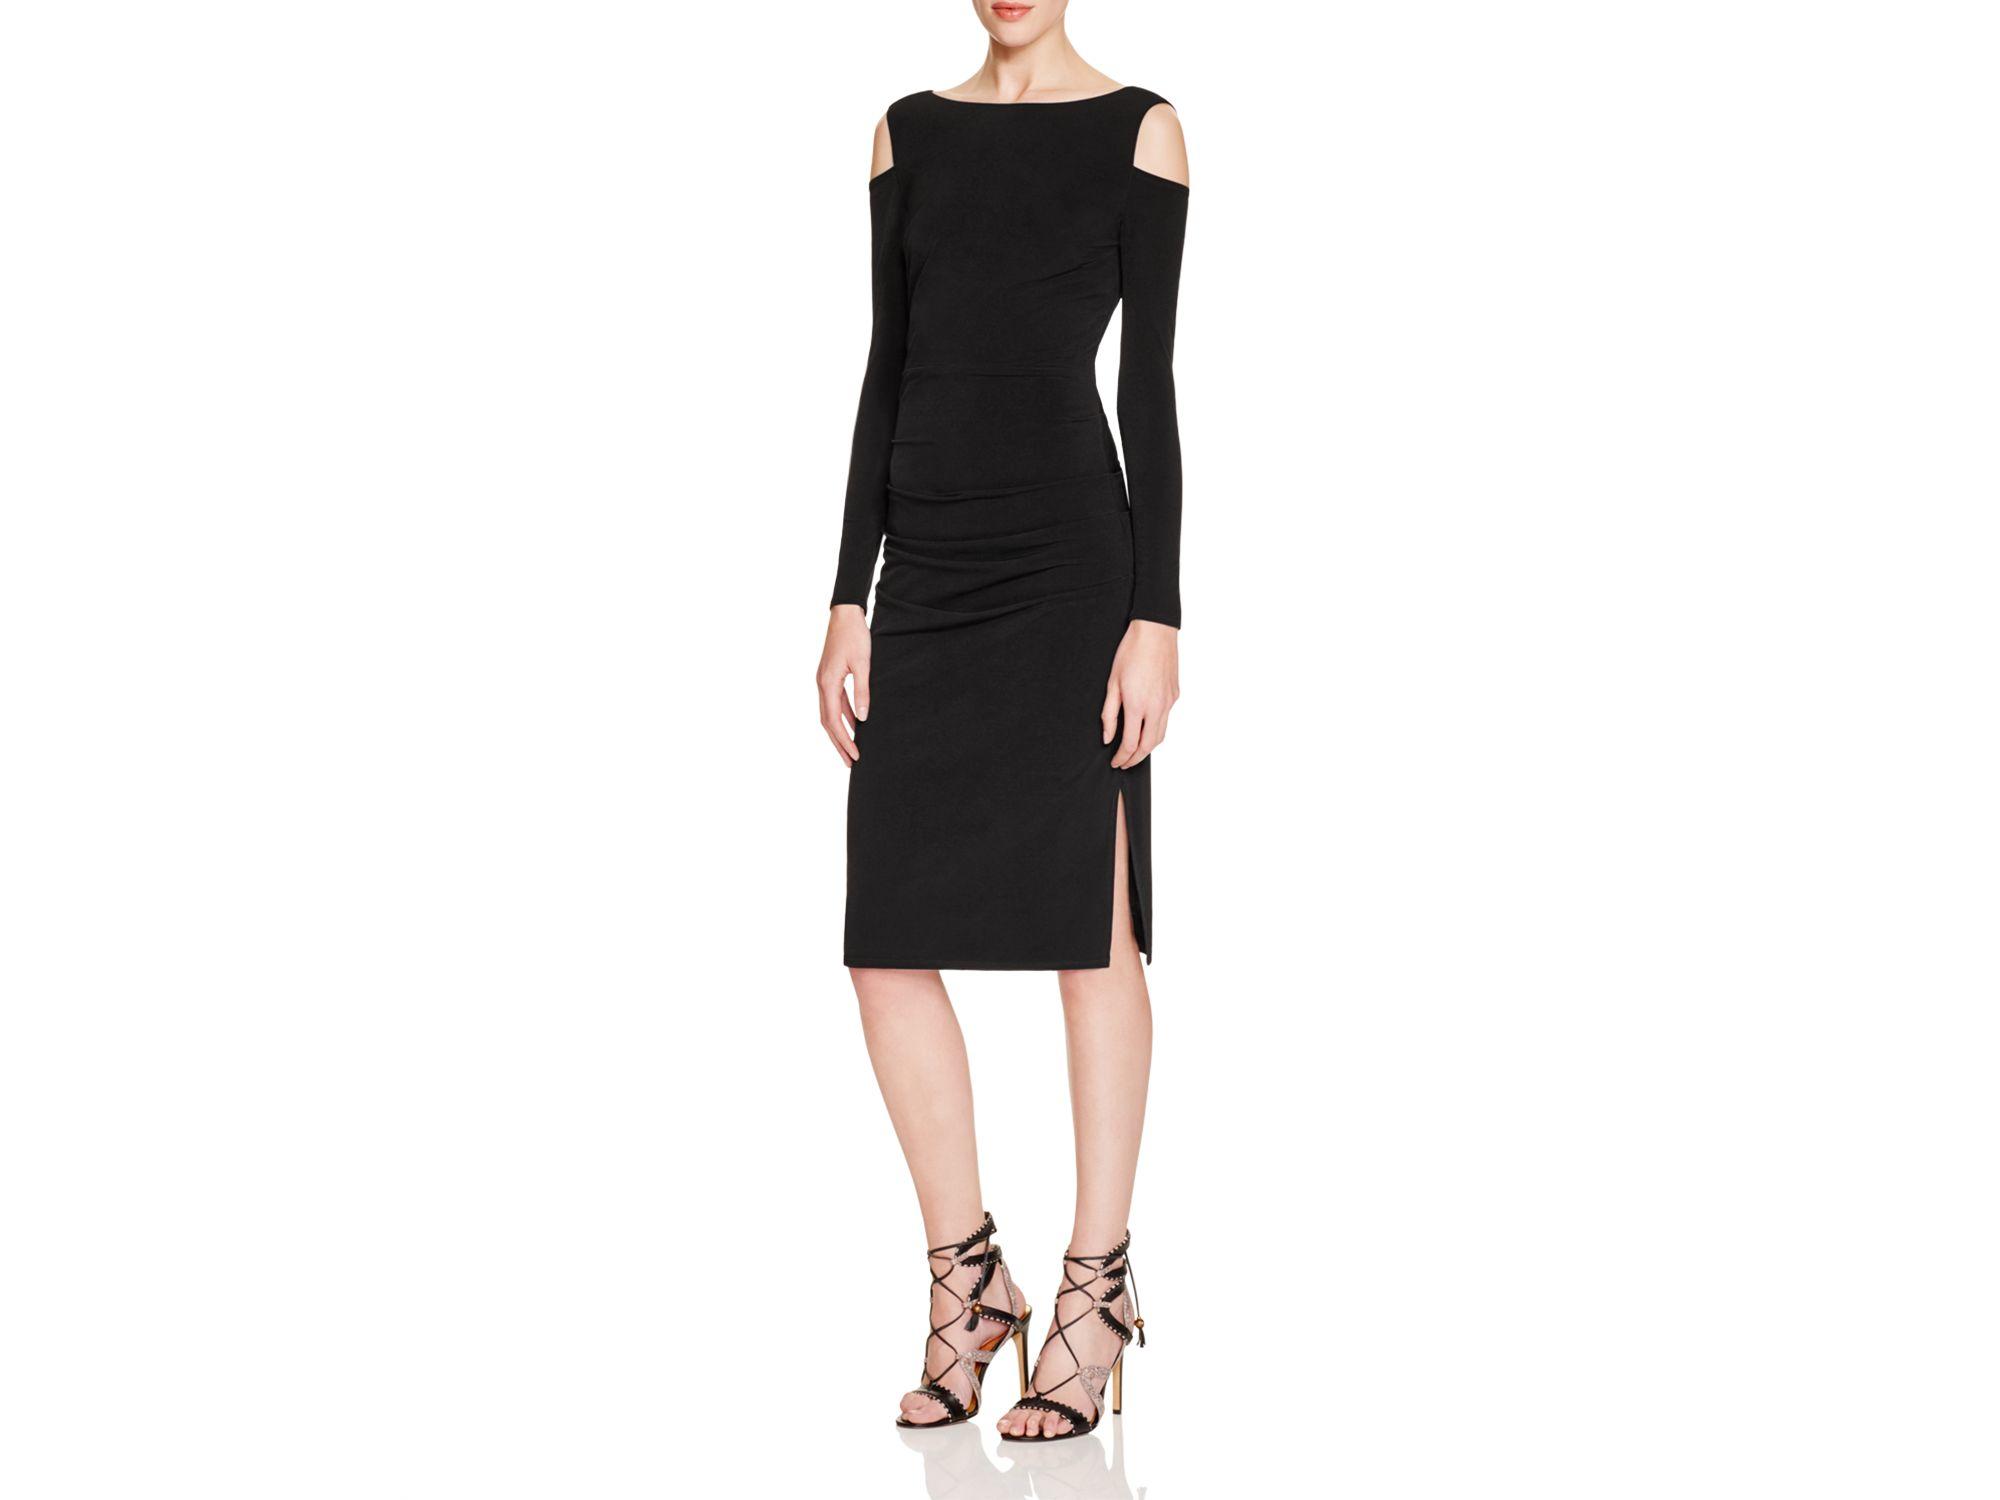 471cfe1449db Laundry Black Dress Lord And Taylor - raveitsafe